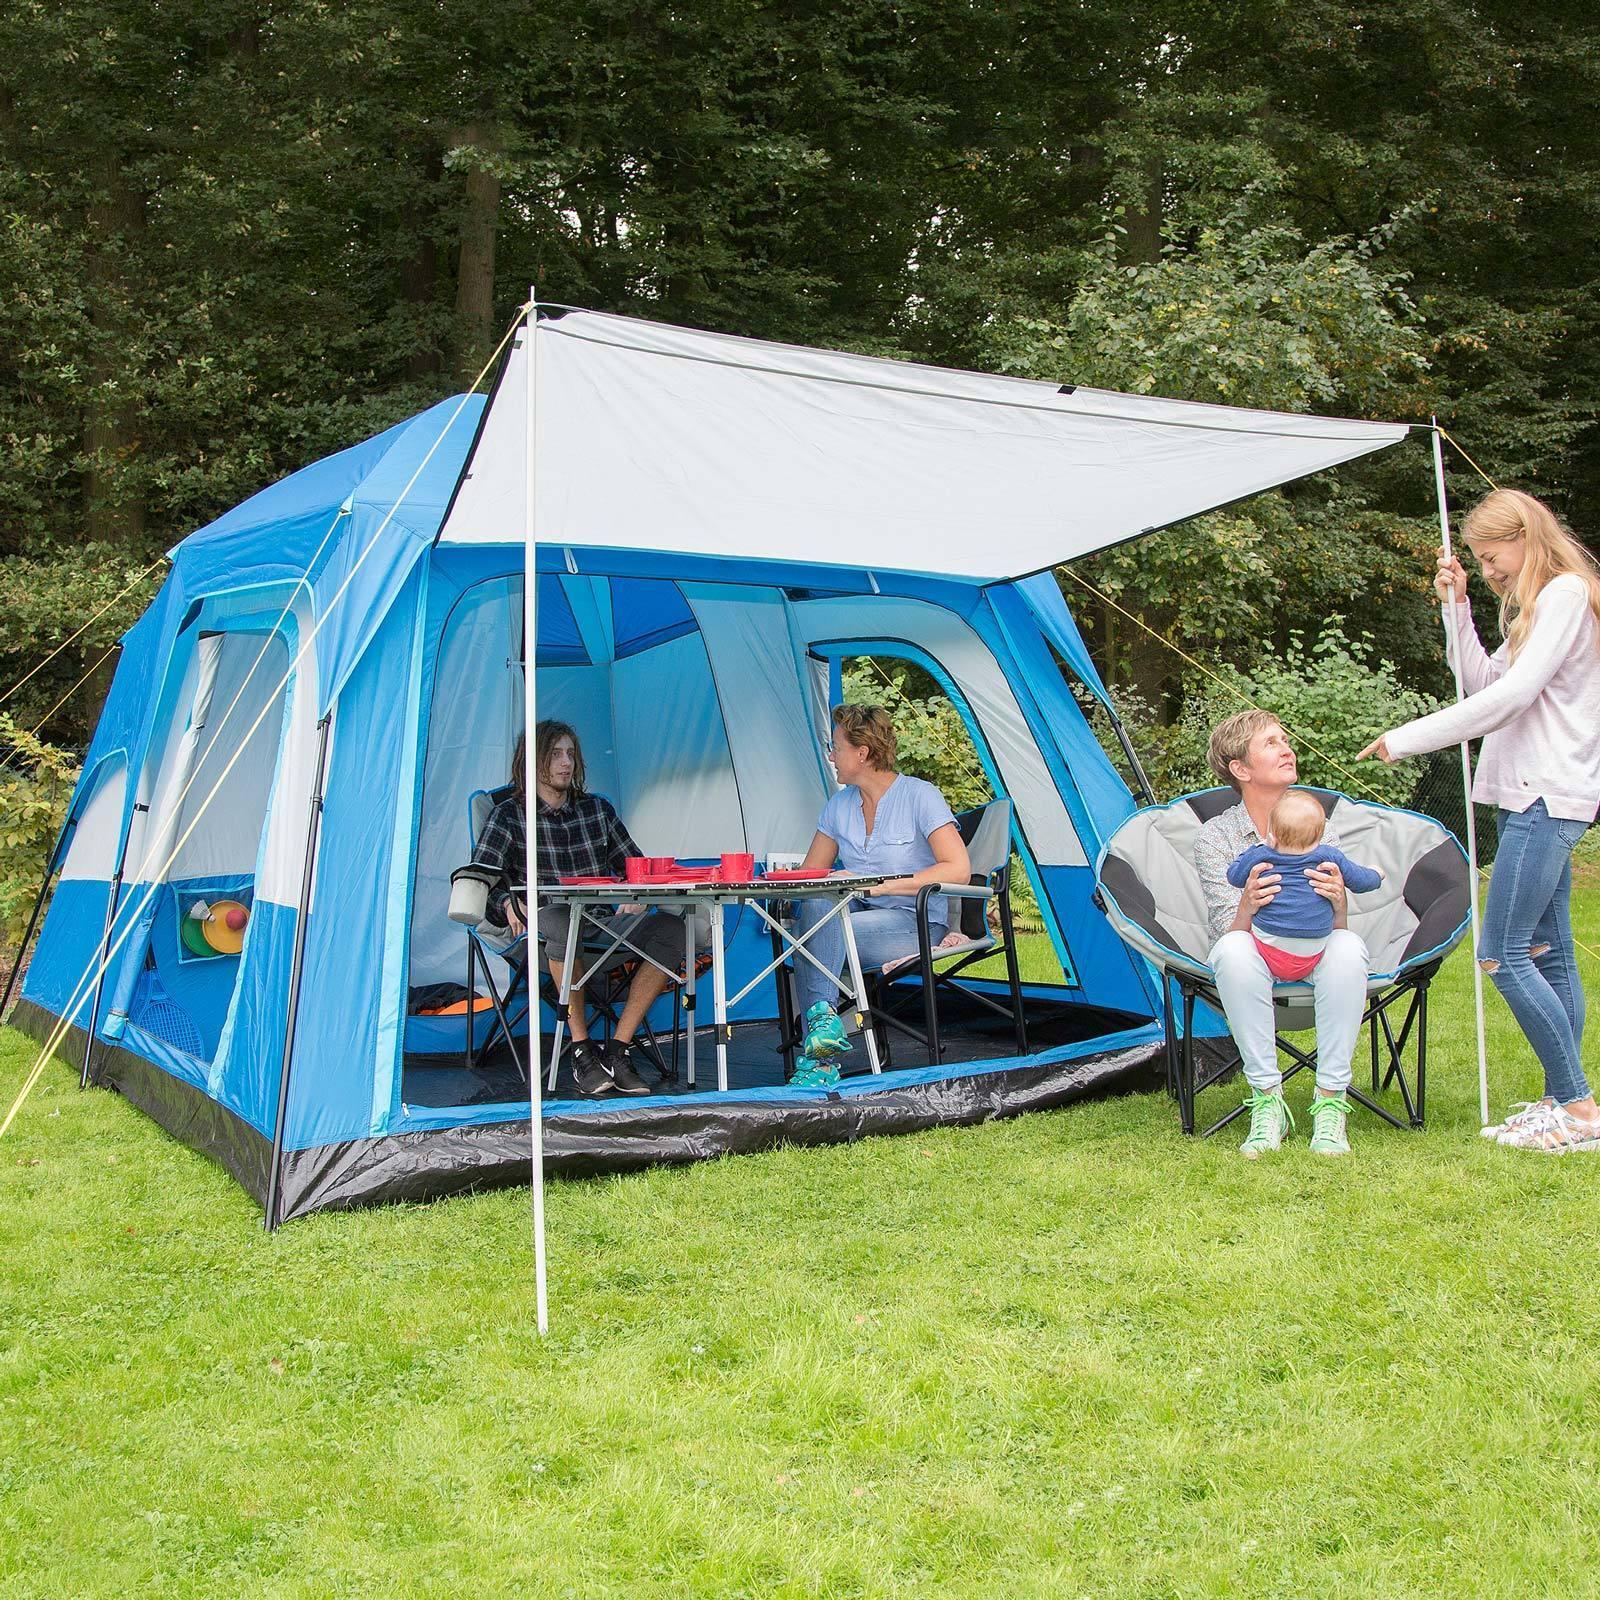 Skandika Tonsberg 5 personas familias tienda de camping tienda de carpa doble pared carpa de azul Nuevo 2e1e14